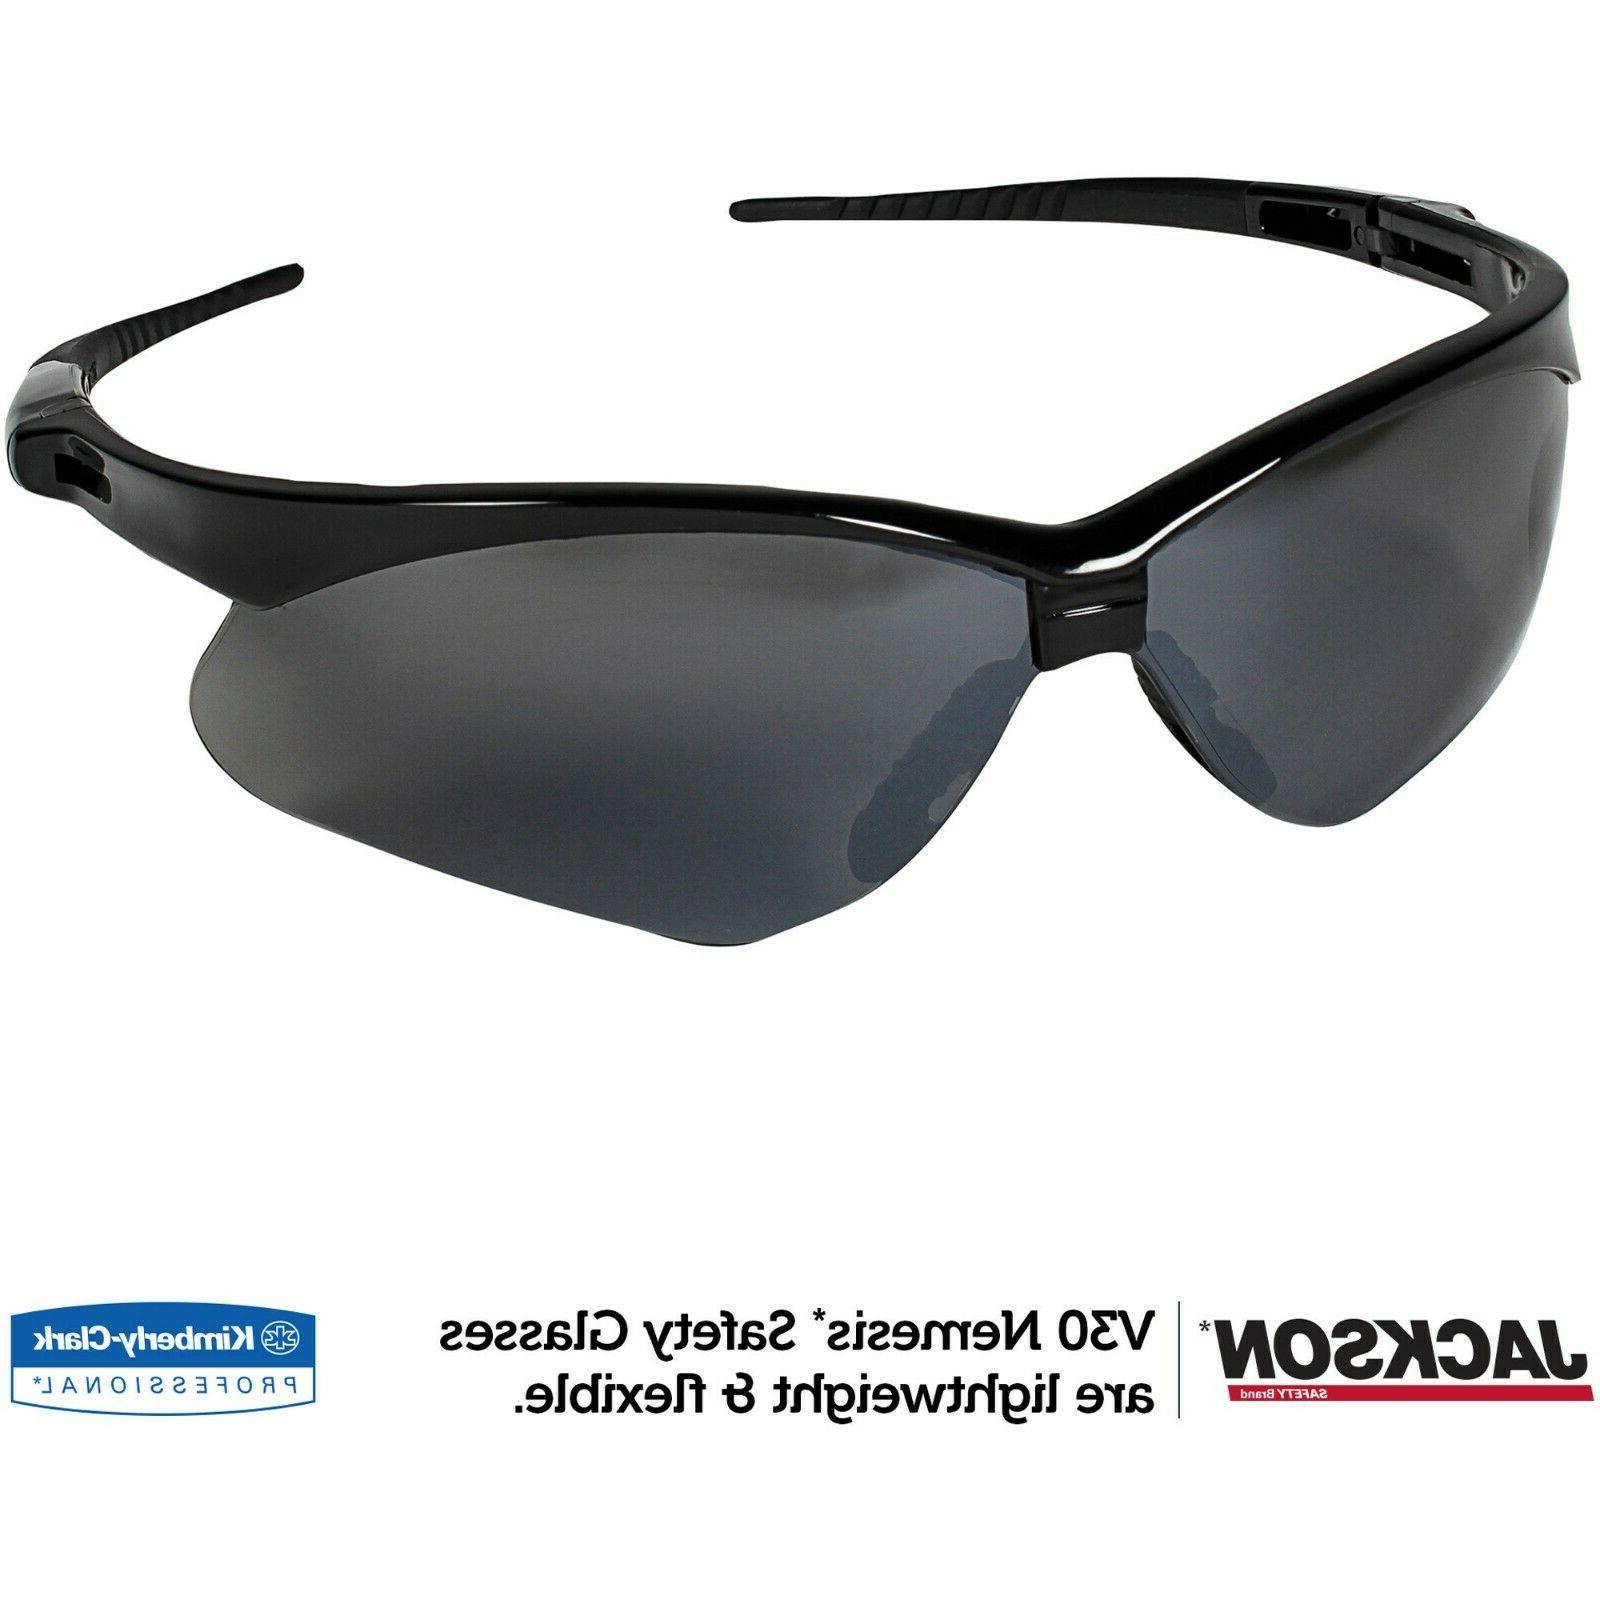 jackson nemesis v30 safety glasses sunglasses various